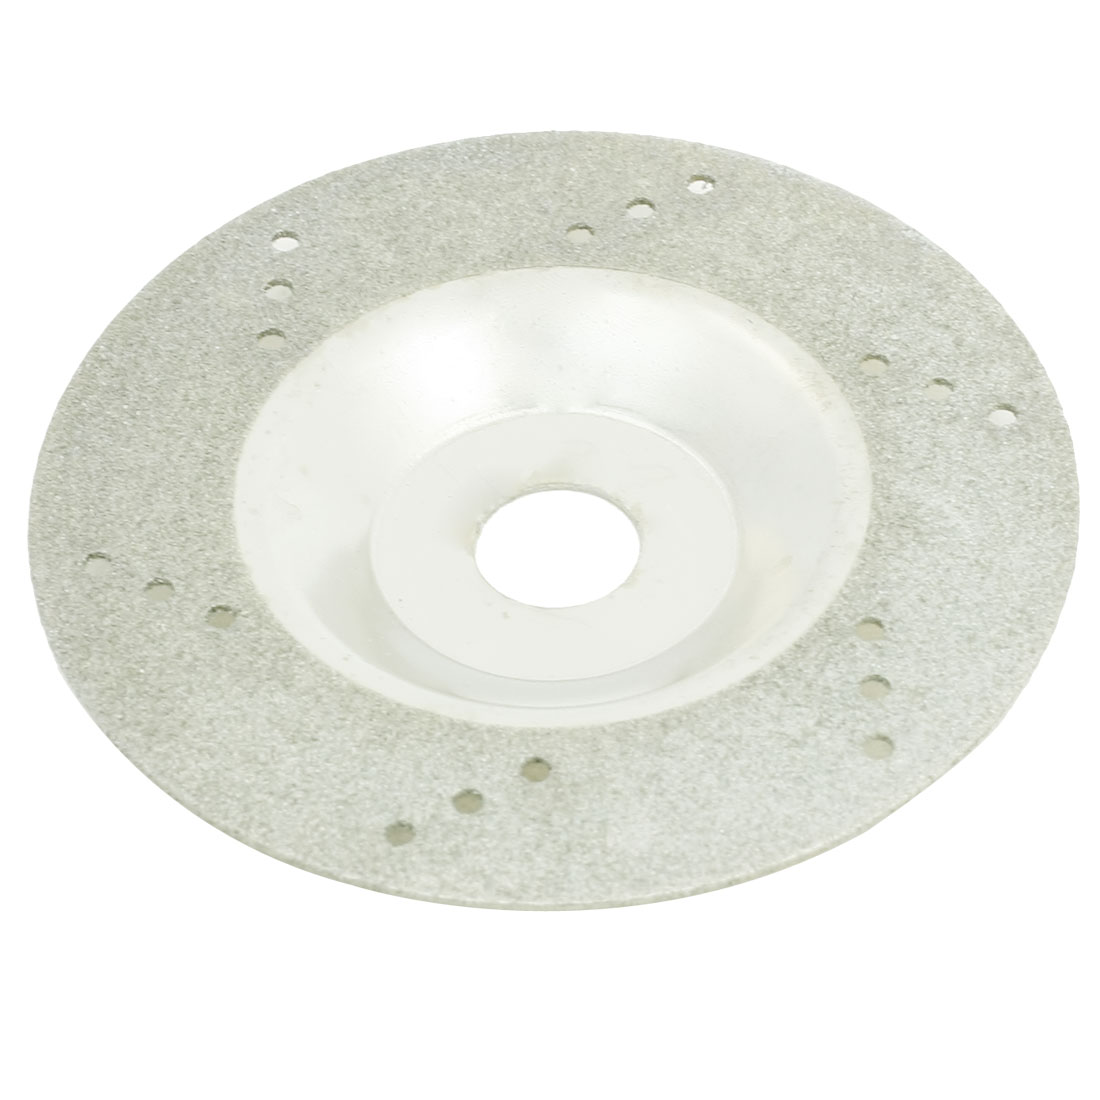 100 OD 16 Inner Dia Polishing Tool One Side Diamon Cutting Wheel Silver Tone